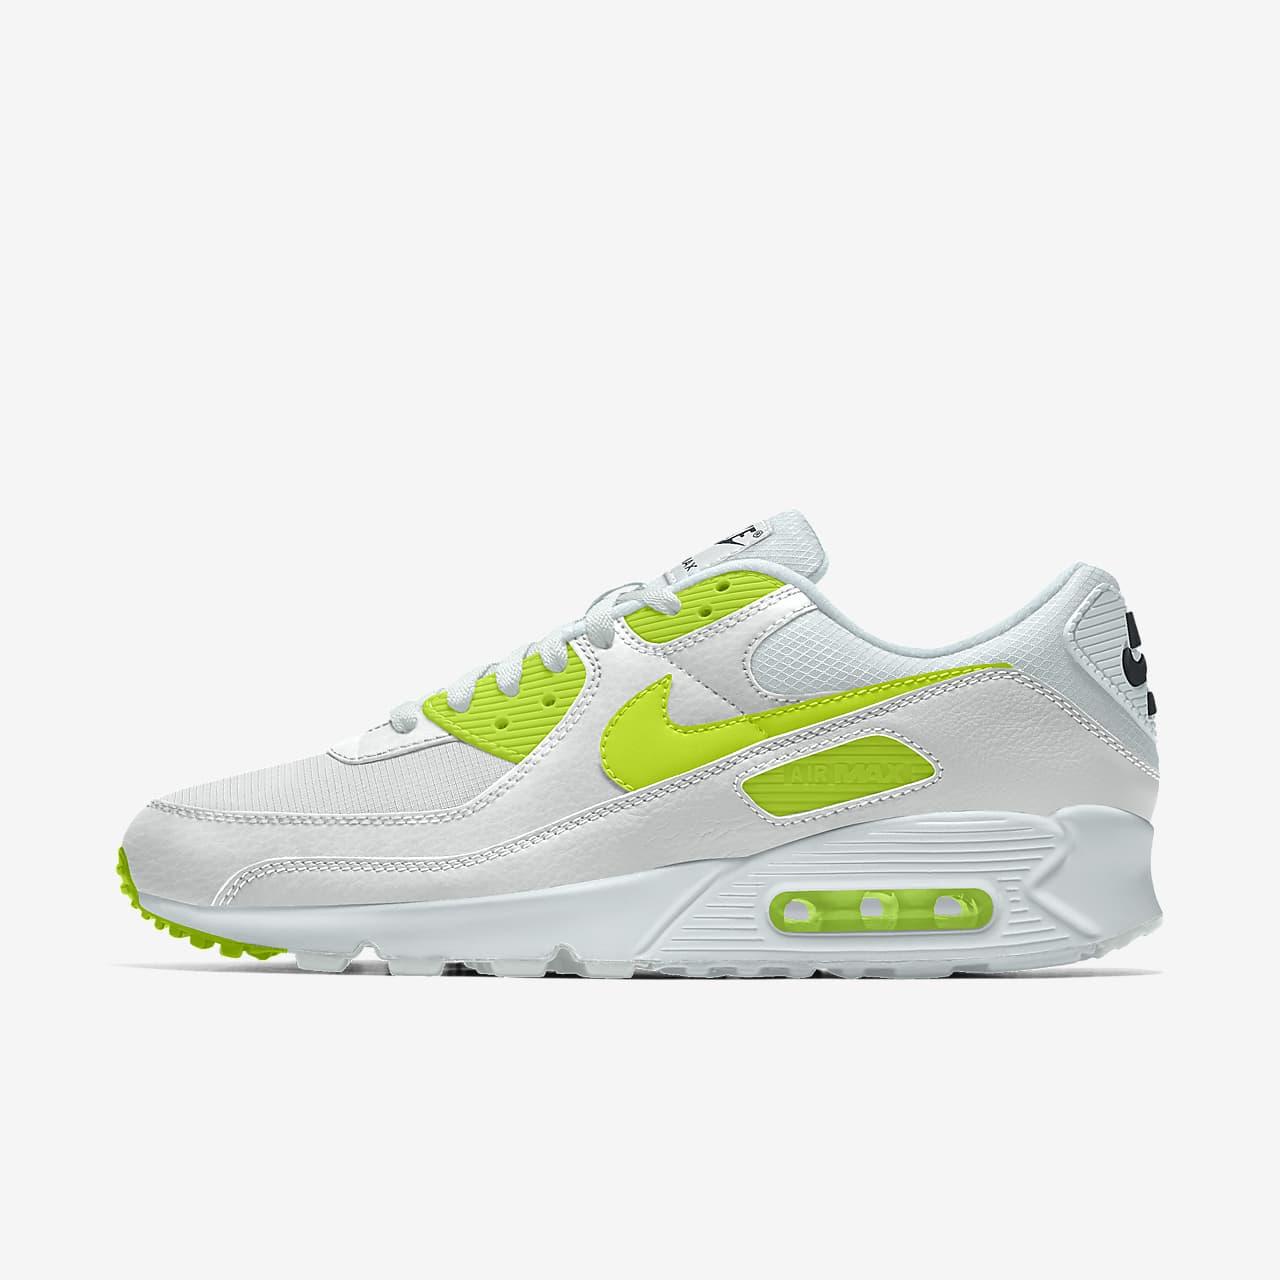 Nike Air Max 90 Unlocked By You Custom Men's Lifestyle Shoe